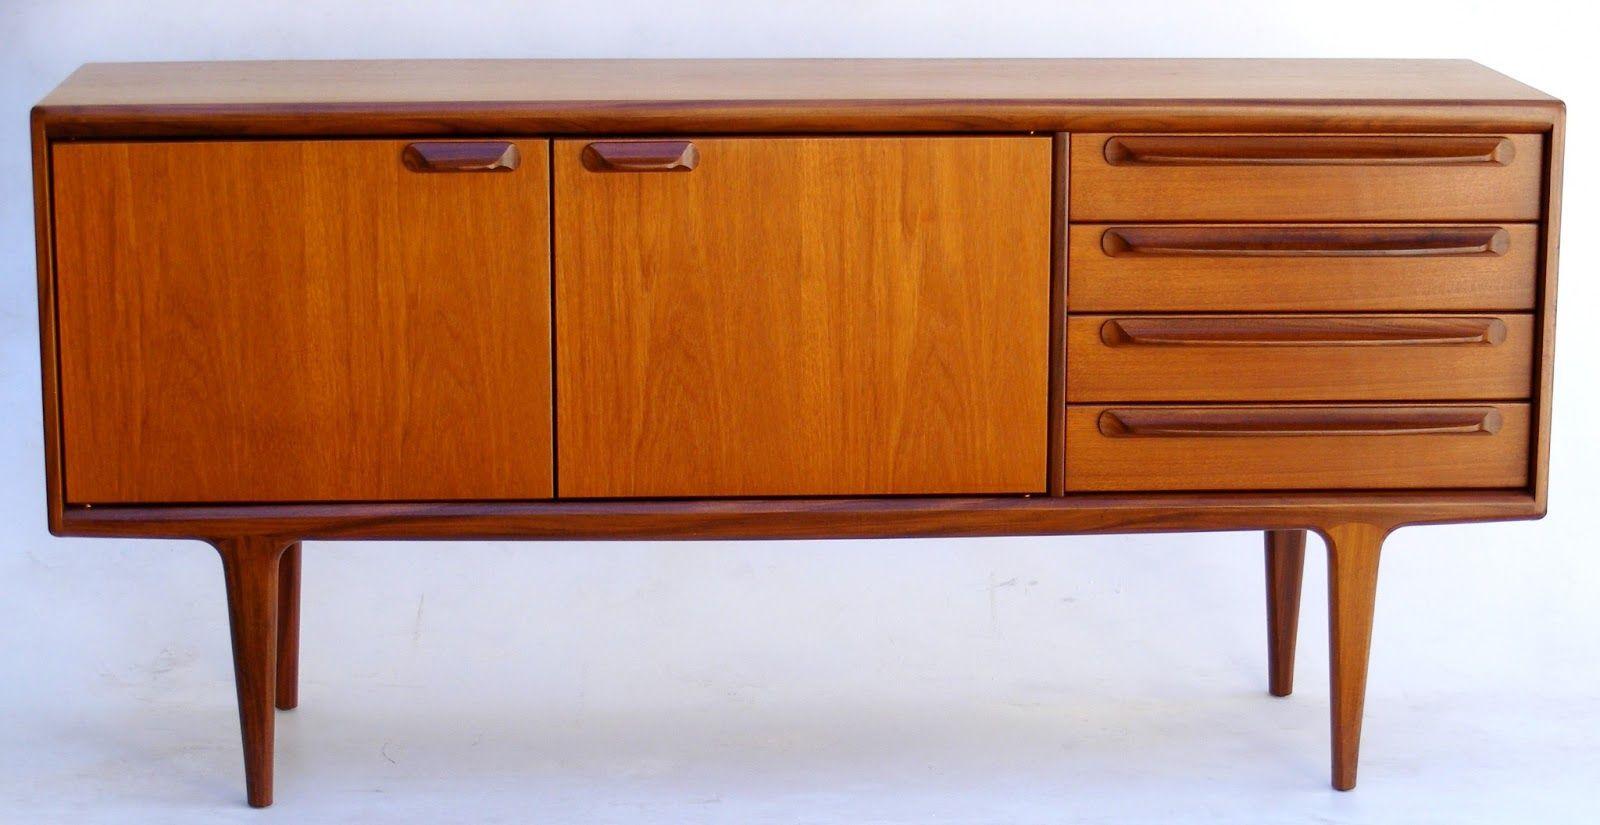 vintage 70s furniture. 60s And 70s Furniture | VAMP FURNITURE: This Weeks New Vintage Stock At Vamp - 22 . 7